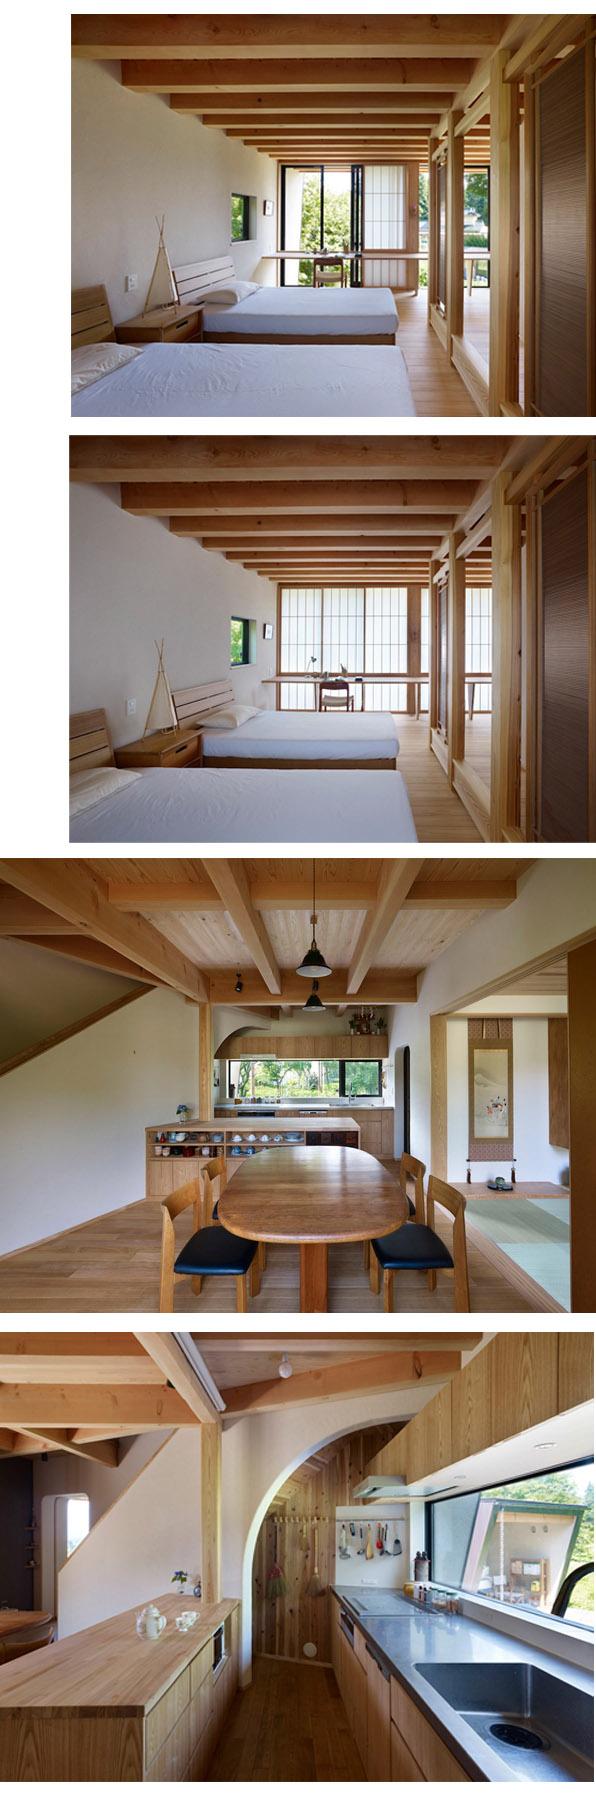 yatsugatake by MDS modular prefab en modus-vivendi arquitectura architecture japan japon casa abanico alps fan house